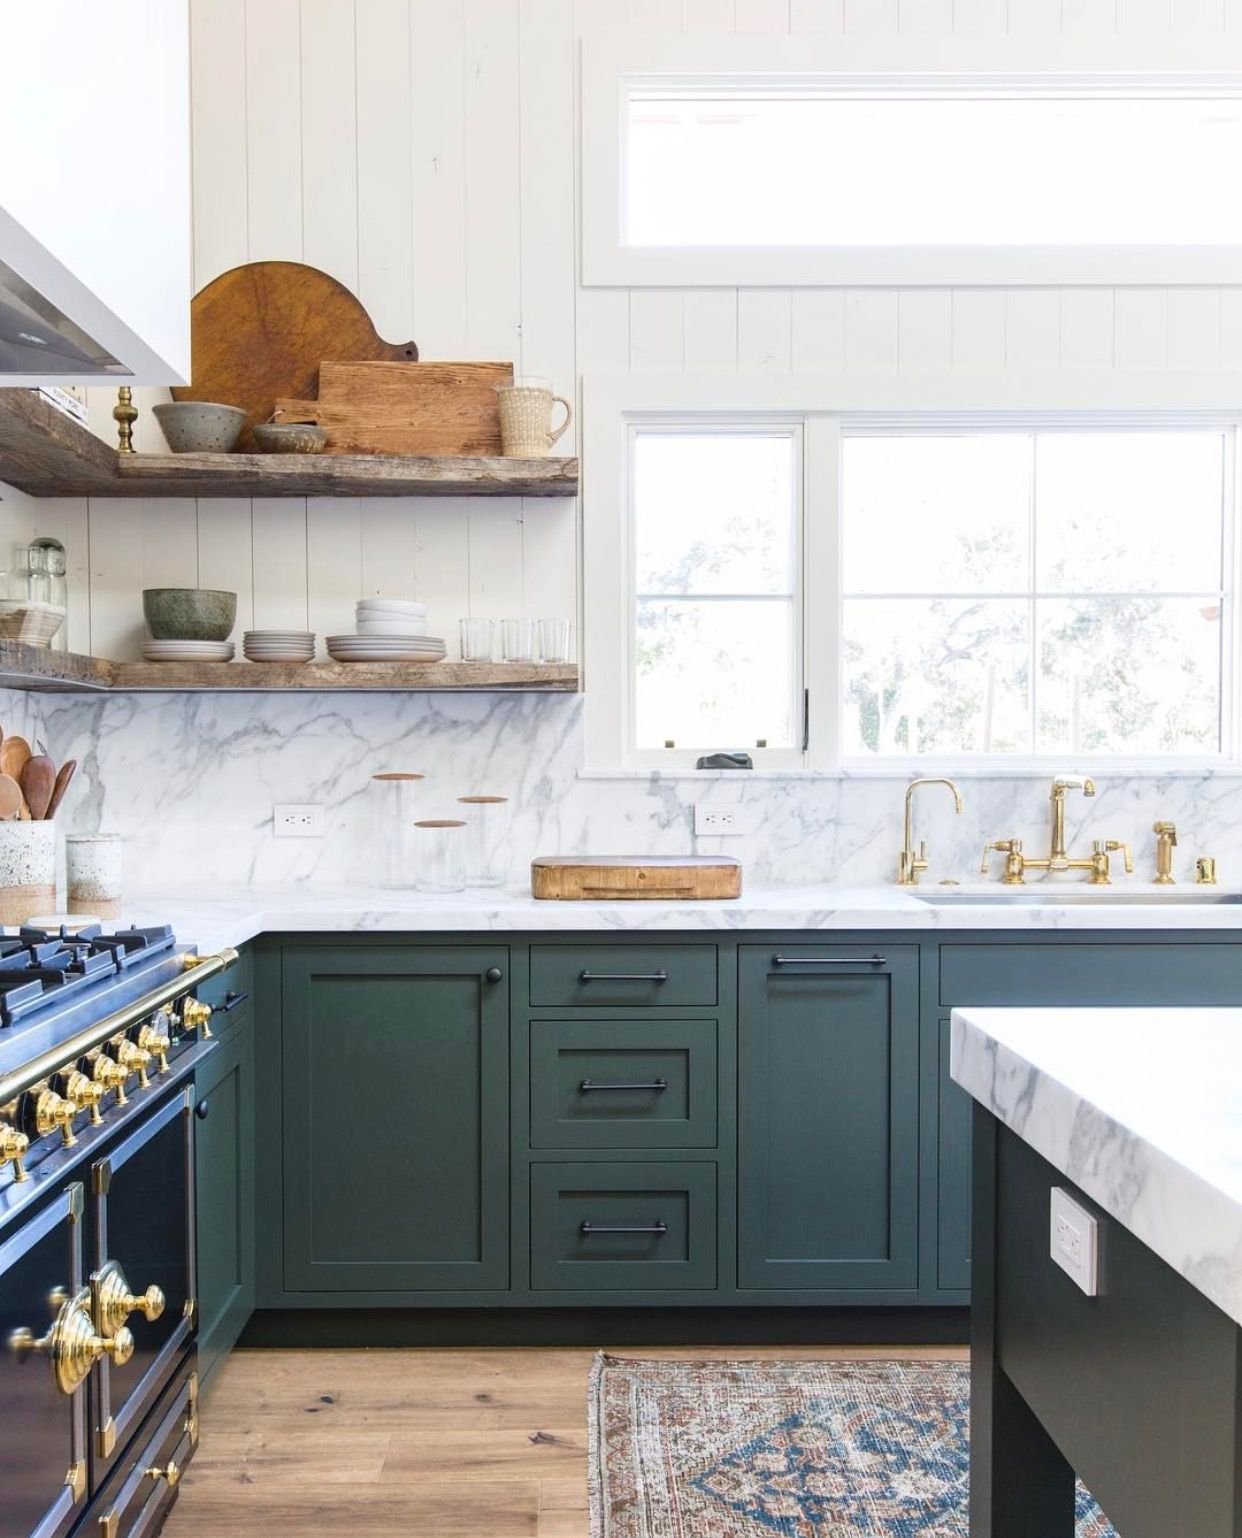 Pin By Paula Conrad On Kitchens Green Kitchen Cabinets Kitchen Cabinet Inspiration Kitchen Trends